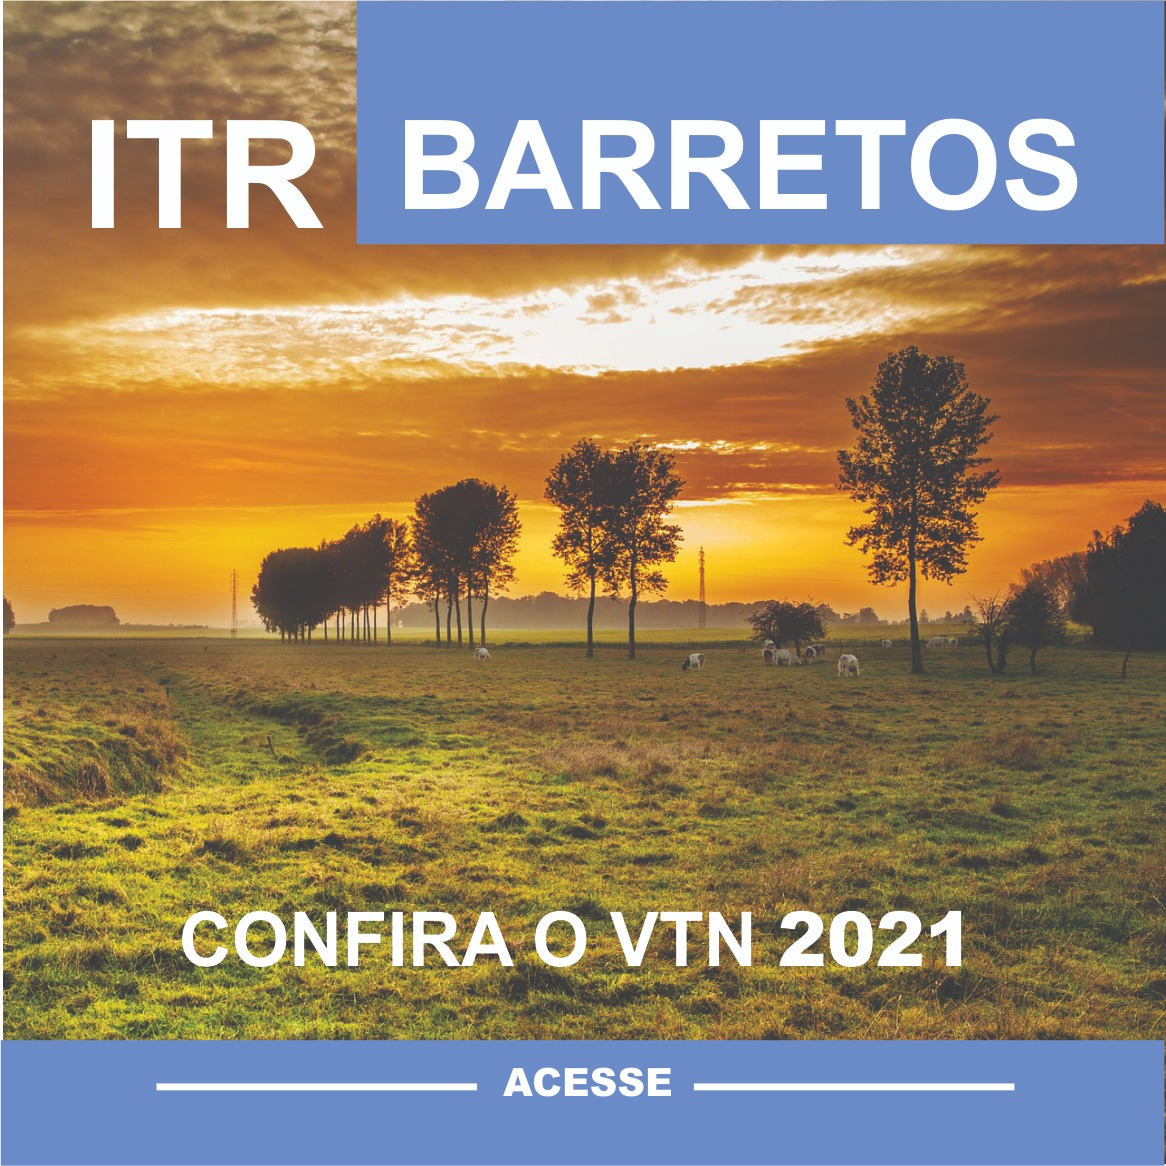 ITR Barretos